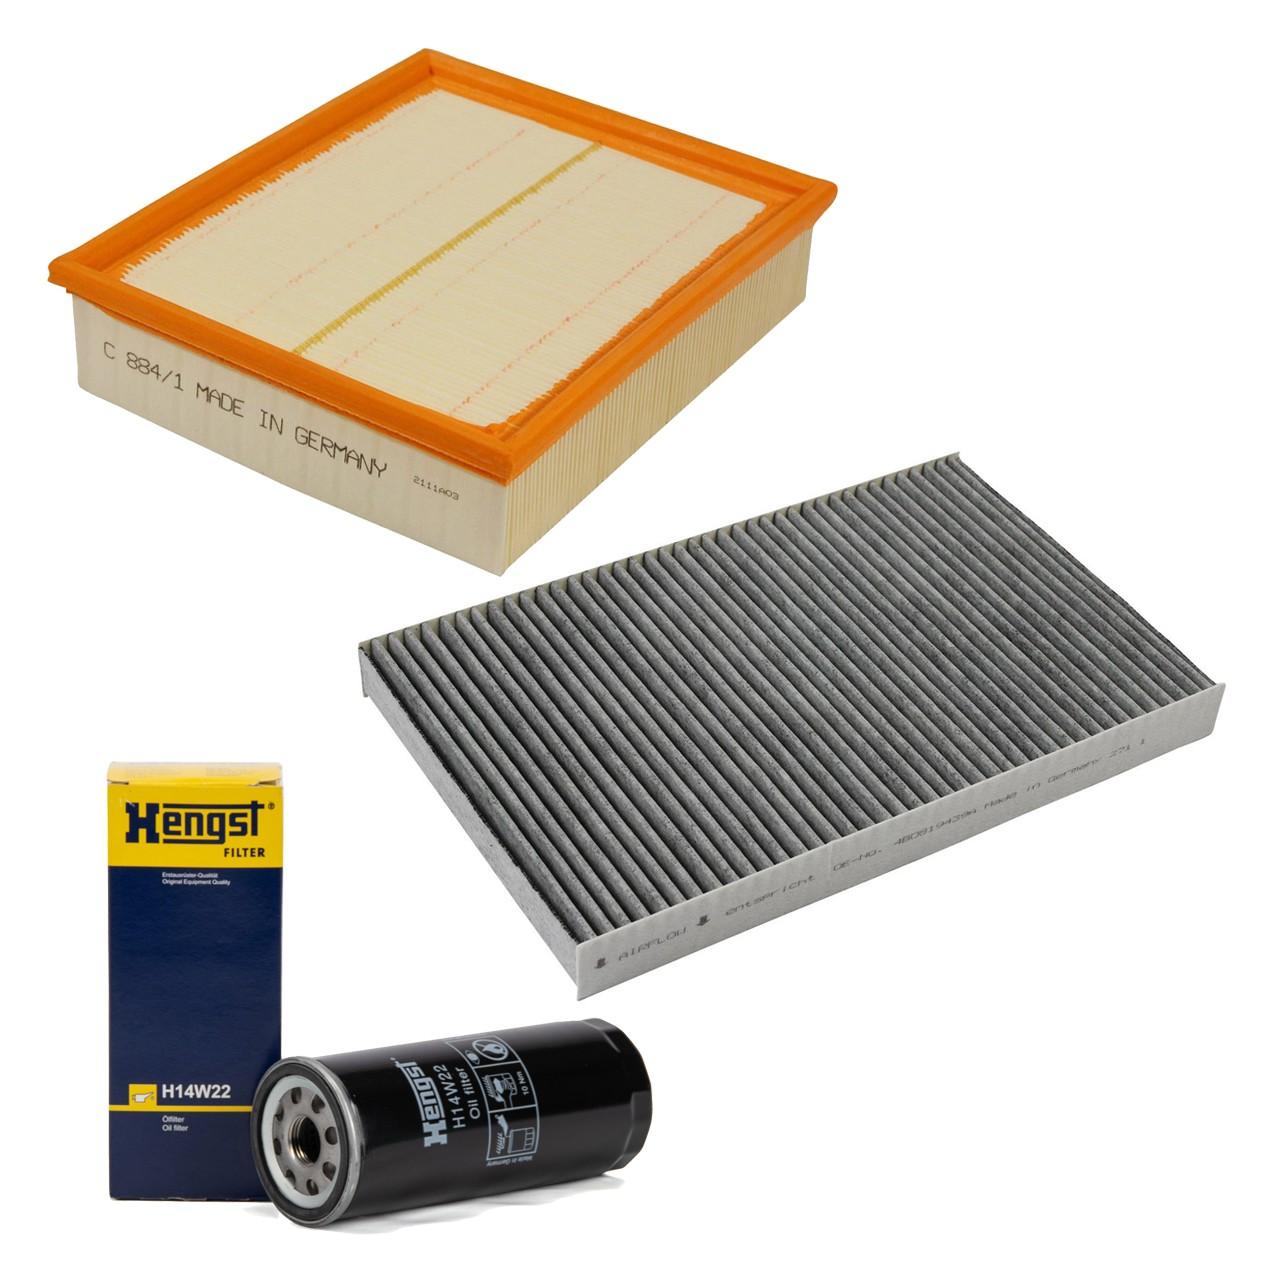 Filterpaket Filterset für Audi A6 (4B C5) 4.2 / S6 quattro 299/340 PS